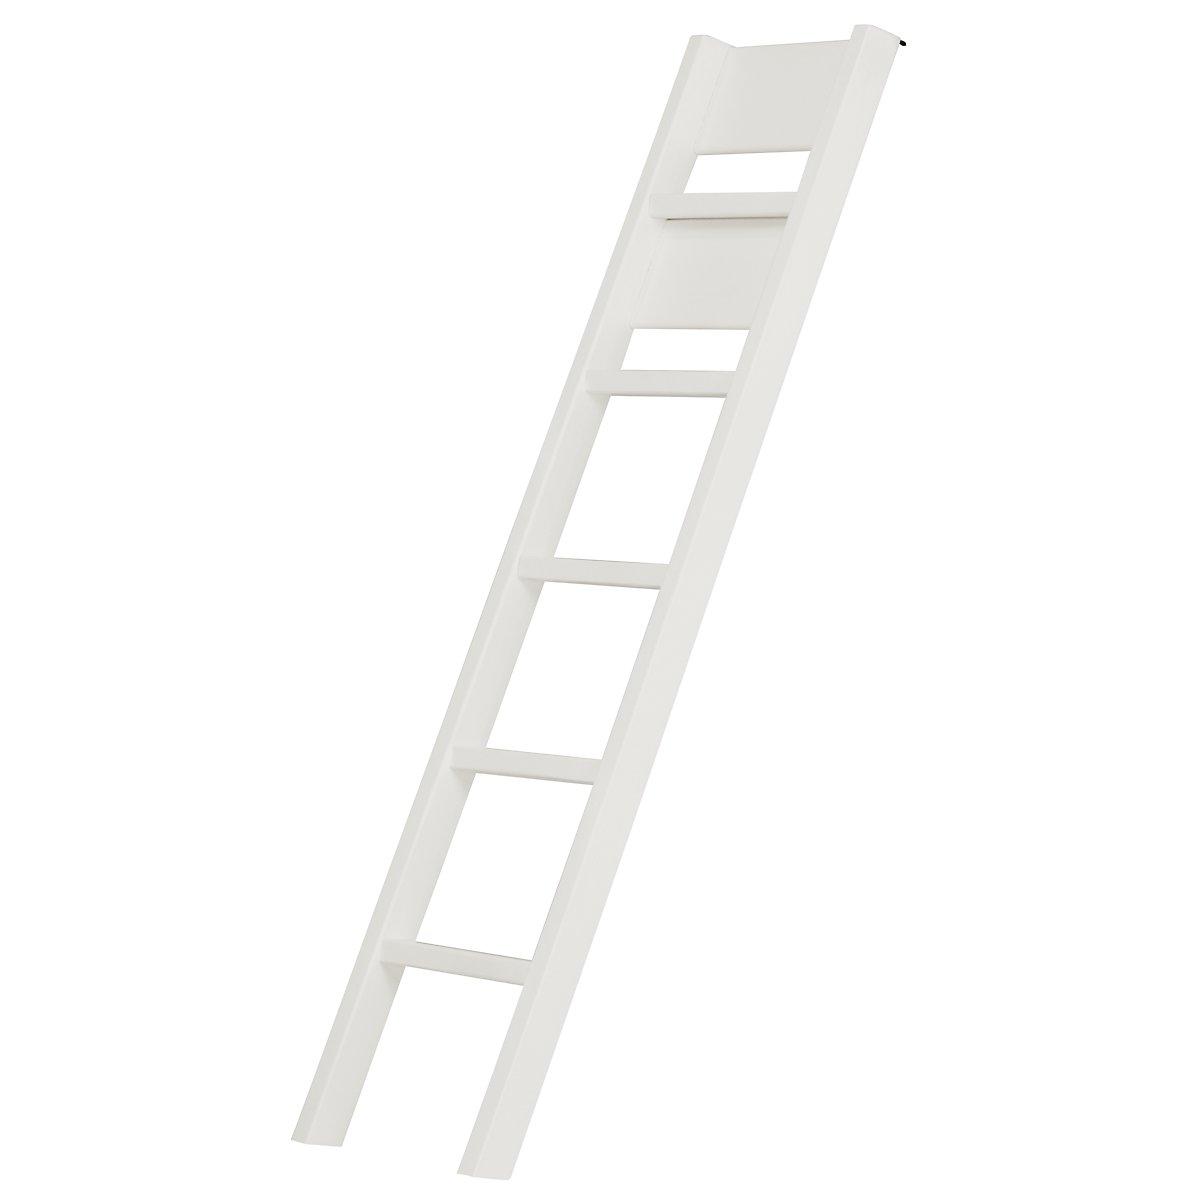 Laguna White Bunk Ladder